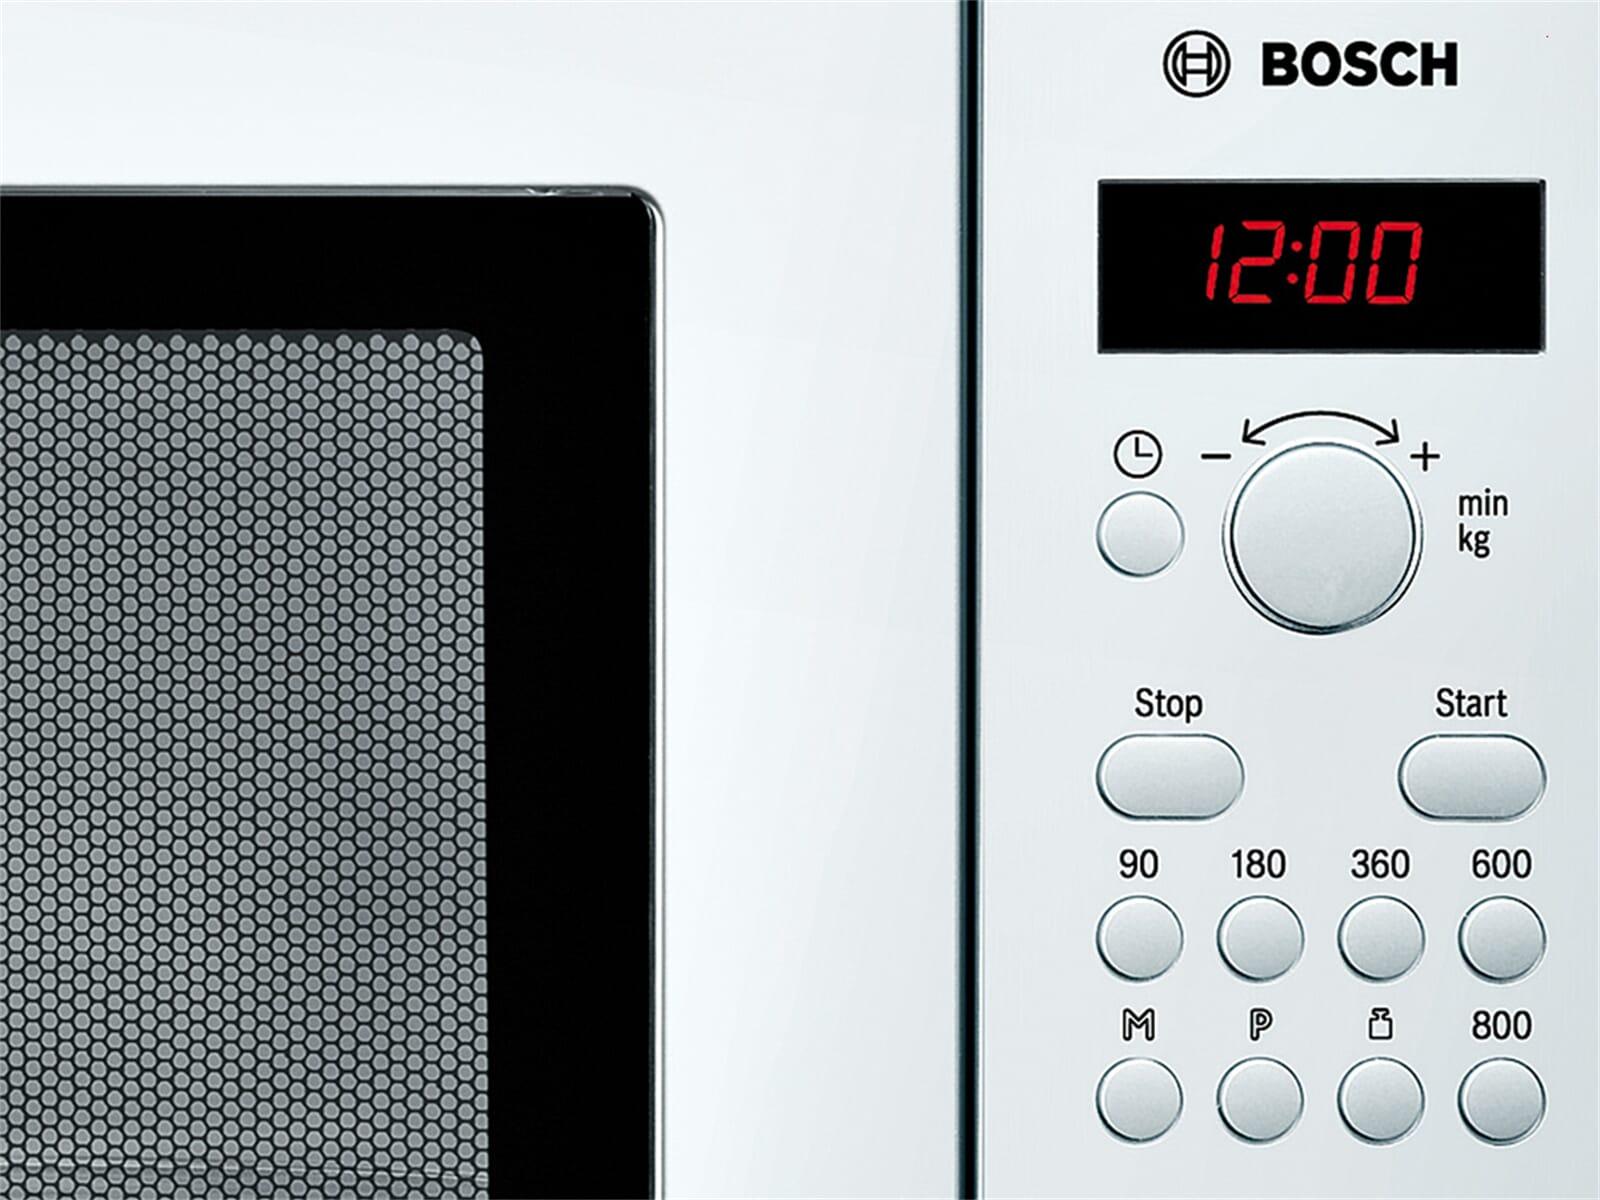 bosch hmt75m521 einbau mikrowelle wei f r 308 90 eur. Black Bedroom Furniture Sets. Home Design Ideas